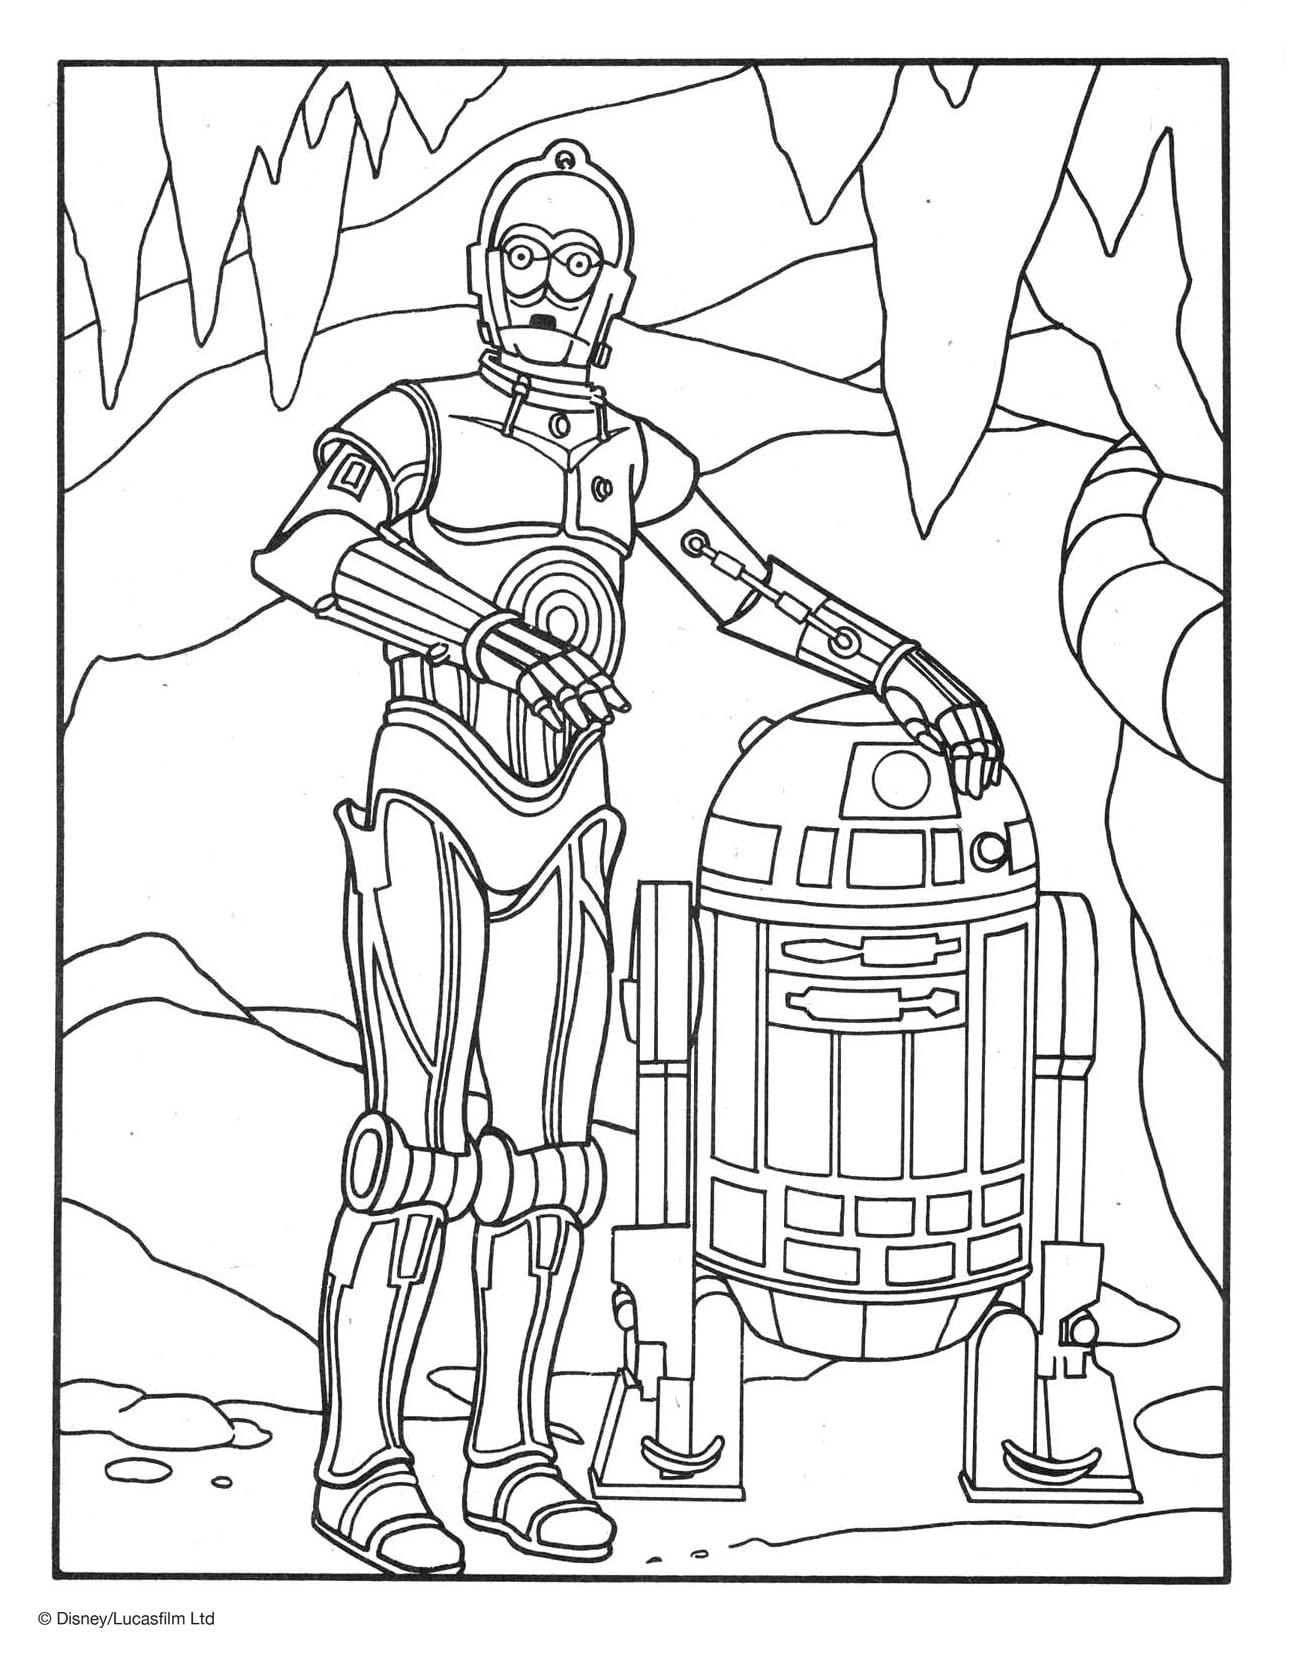 R2d2 Coloring Pages